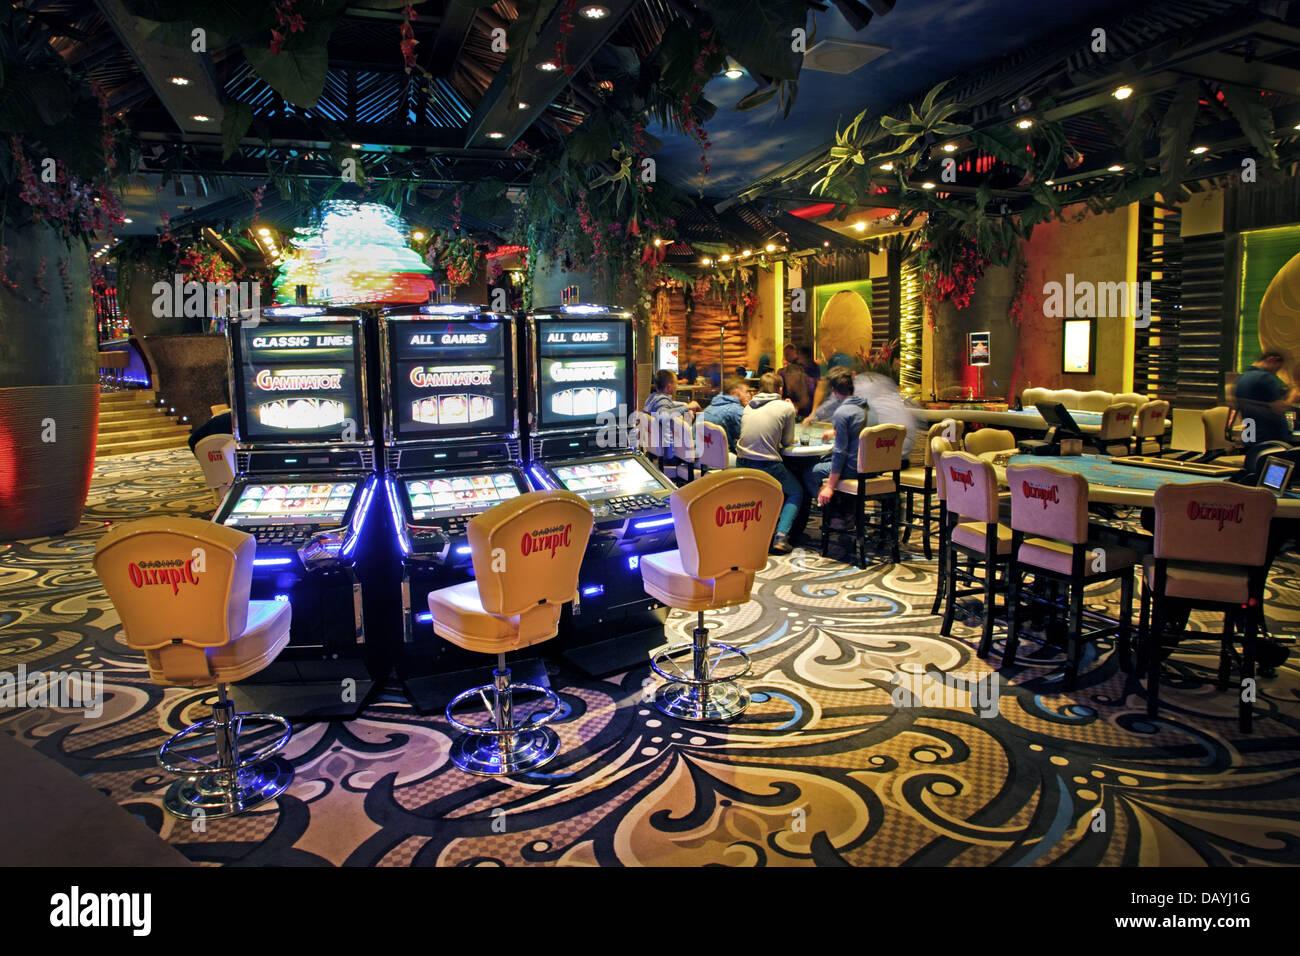 Olympic gambling problem gambling consequences